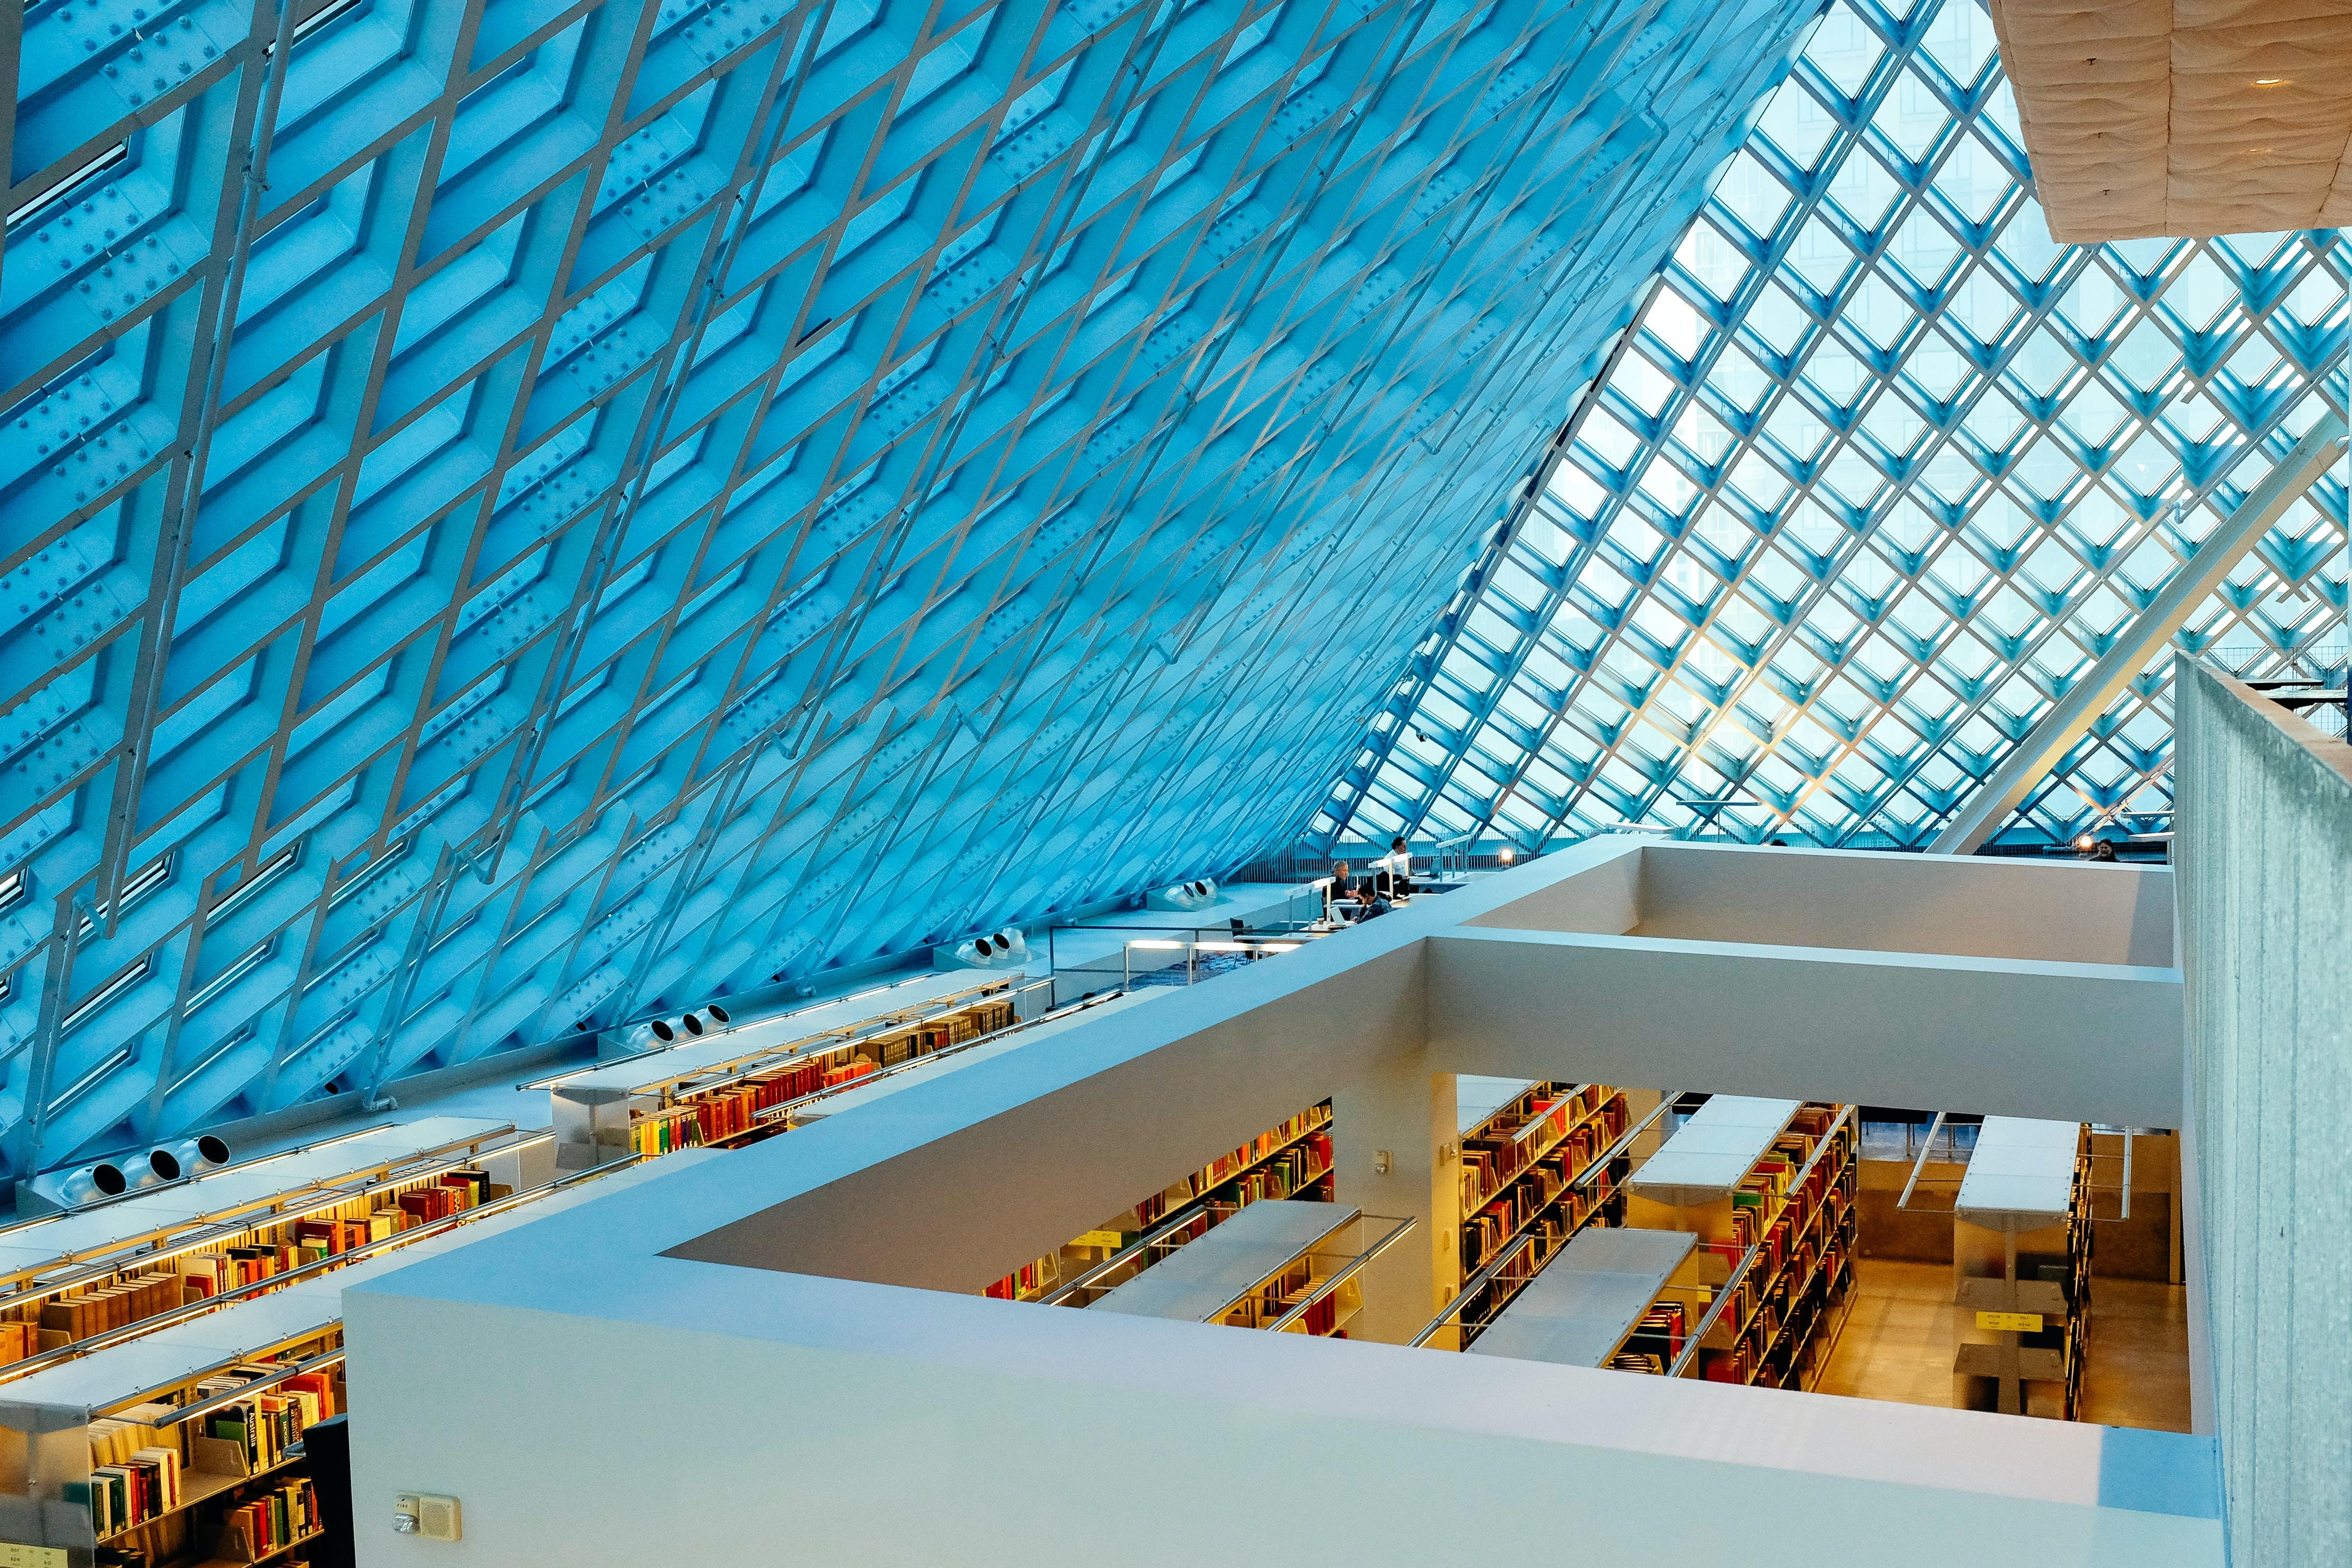 blue glass roof